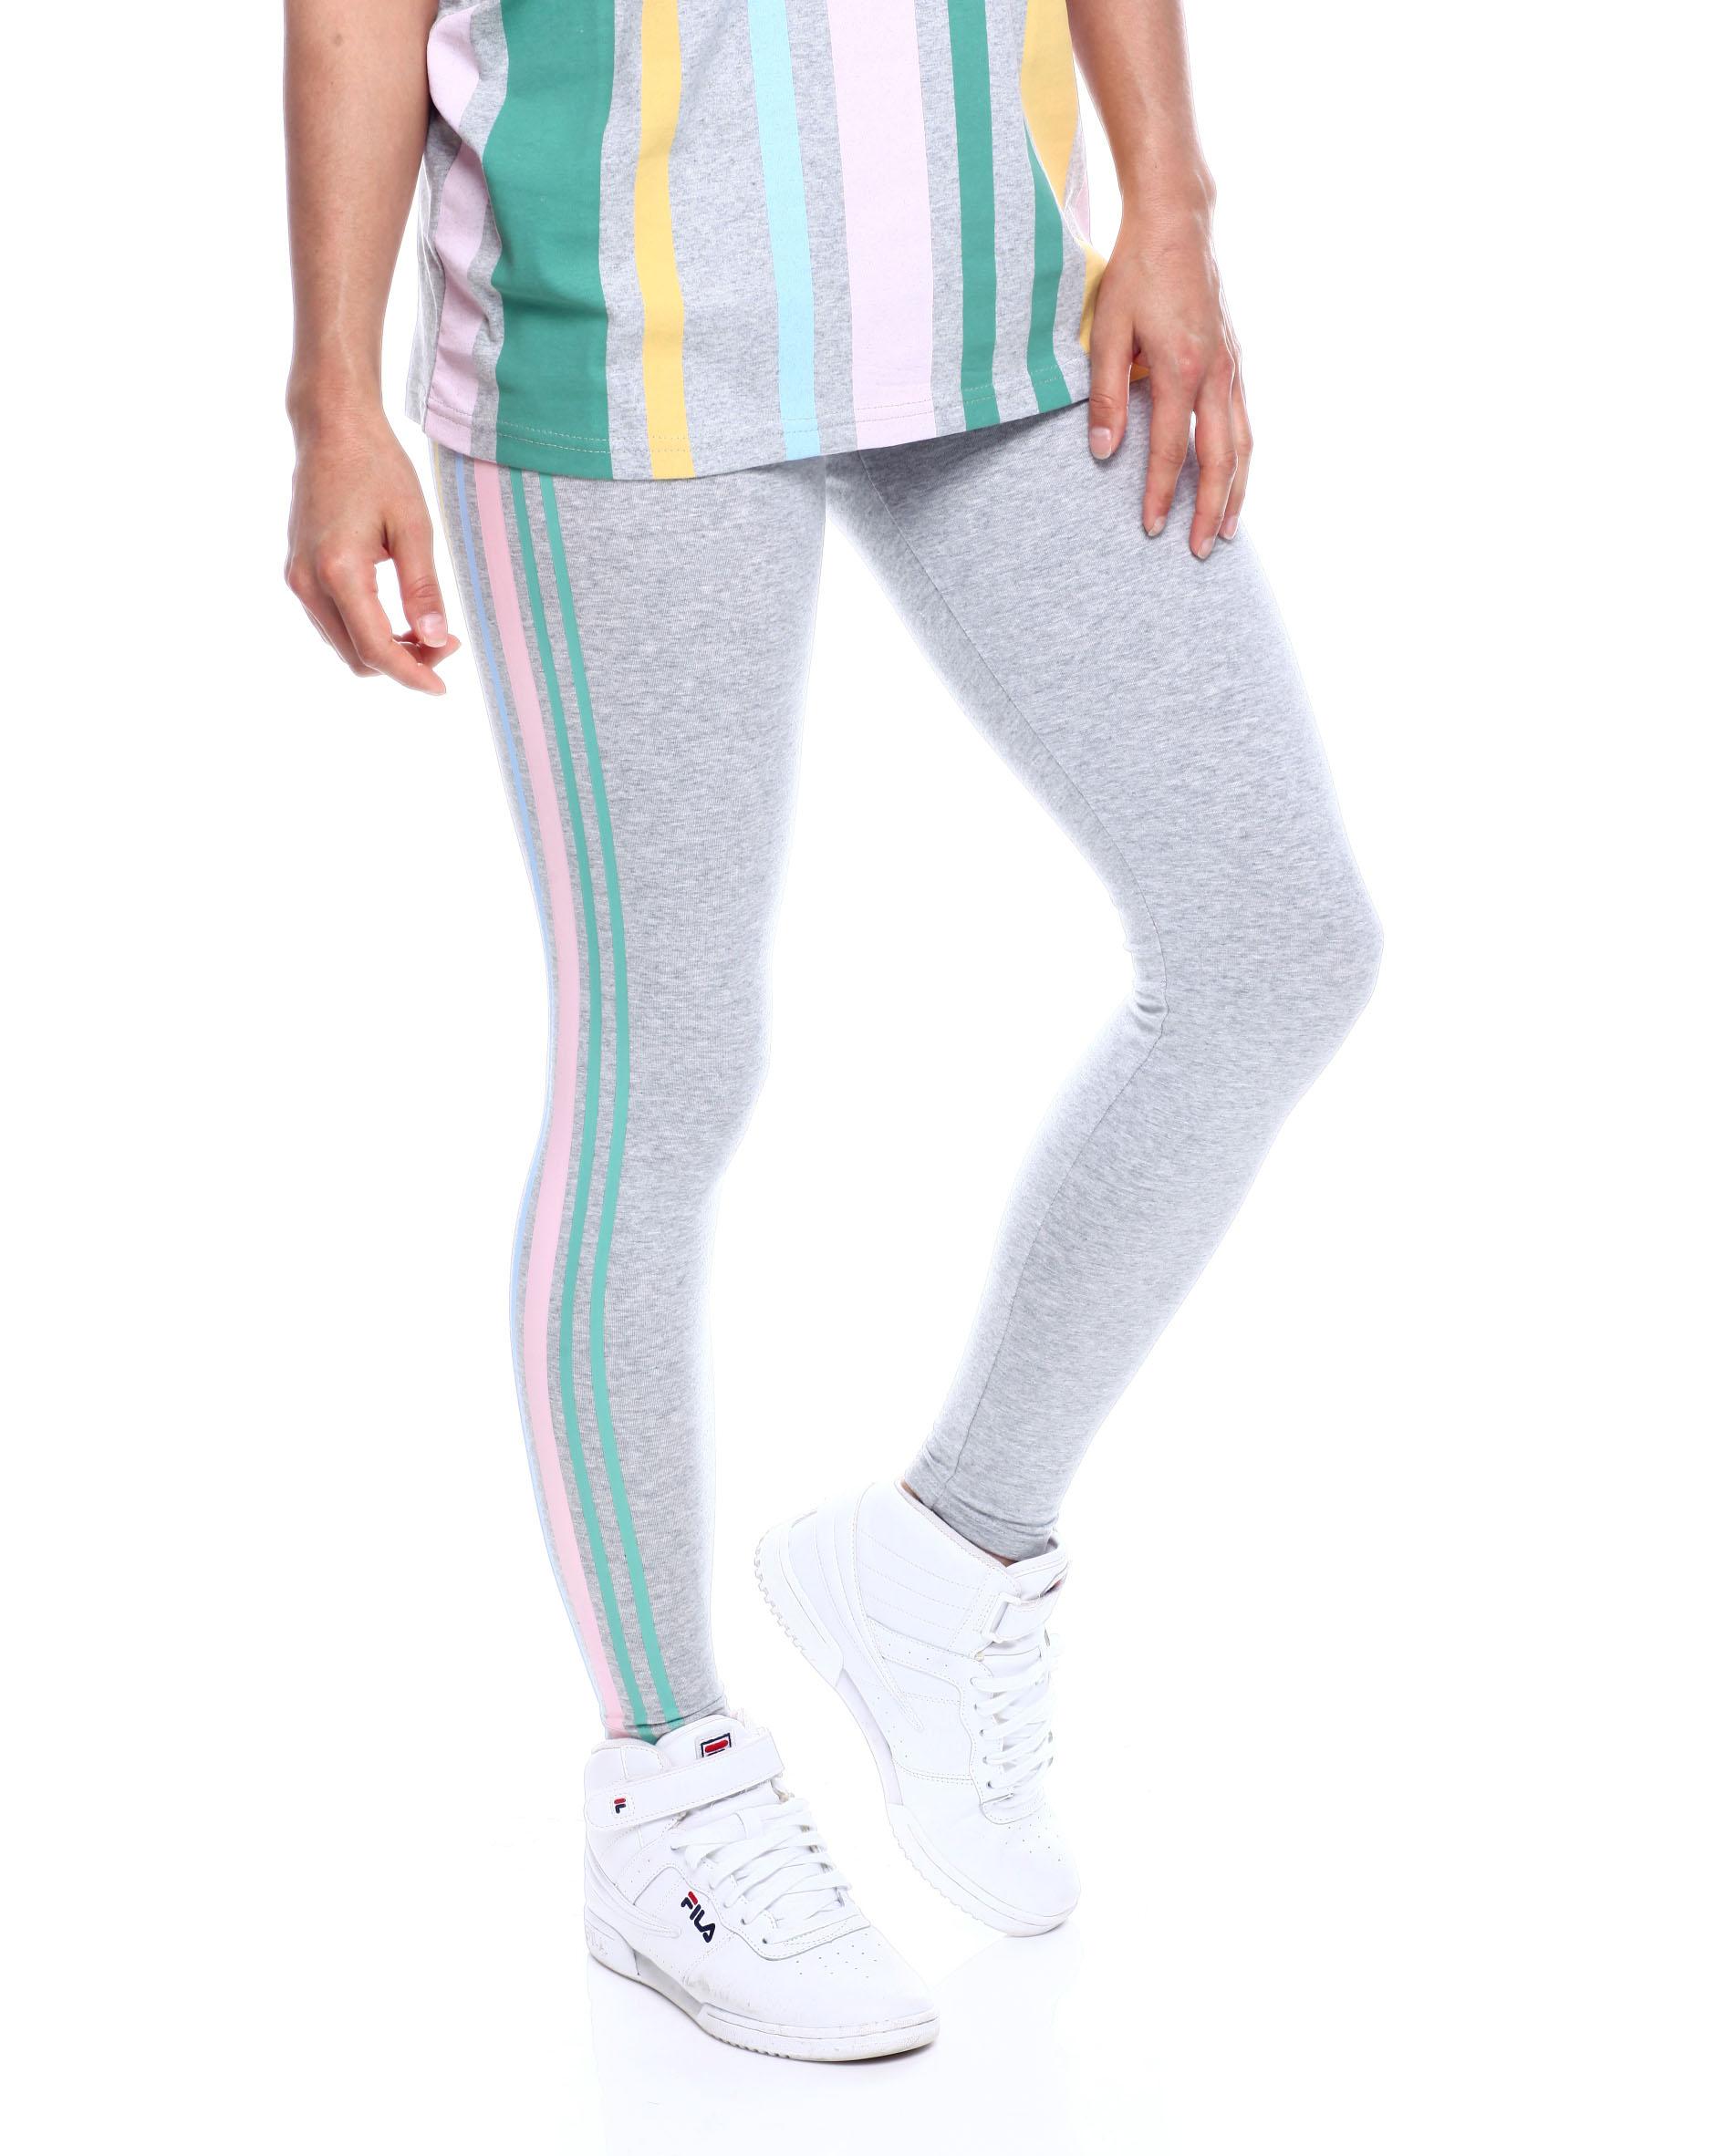 Buy Virginia Legging Women's Bottoms from Fila. Find Fila ...